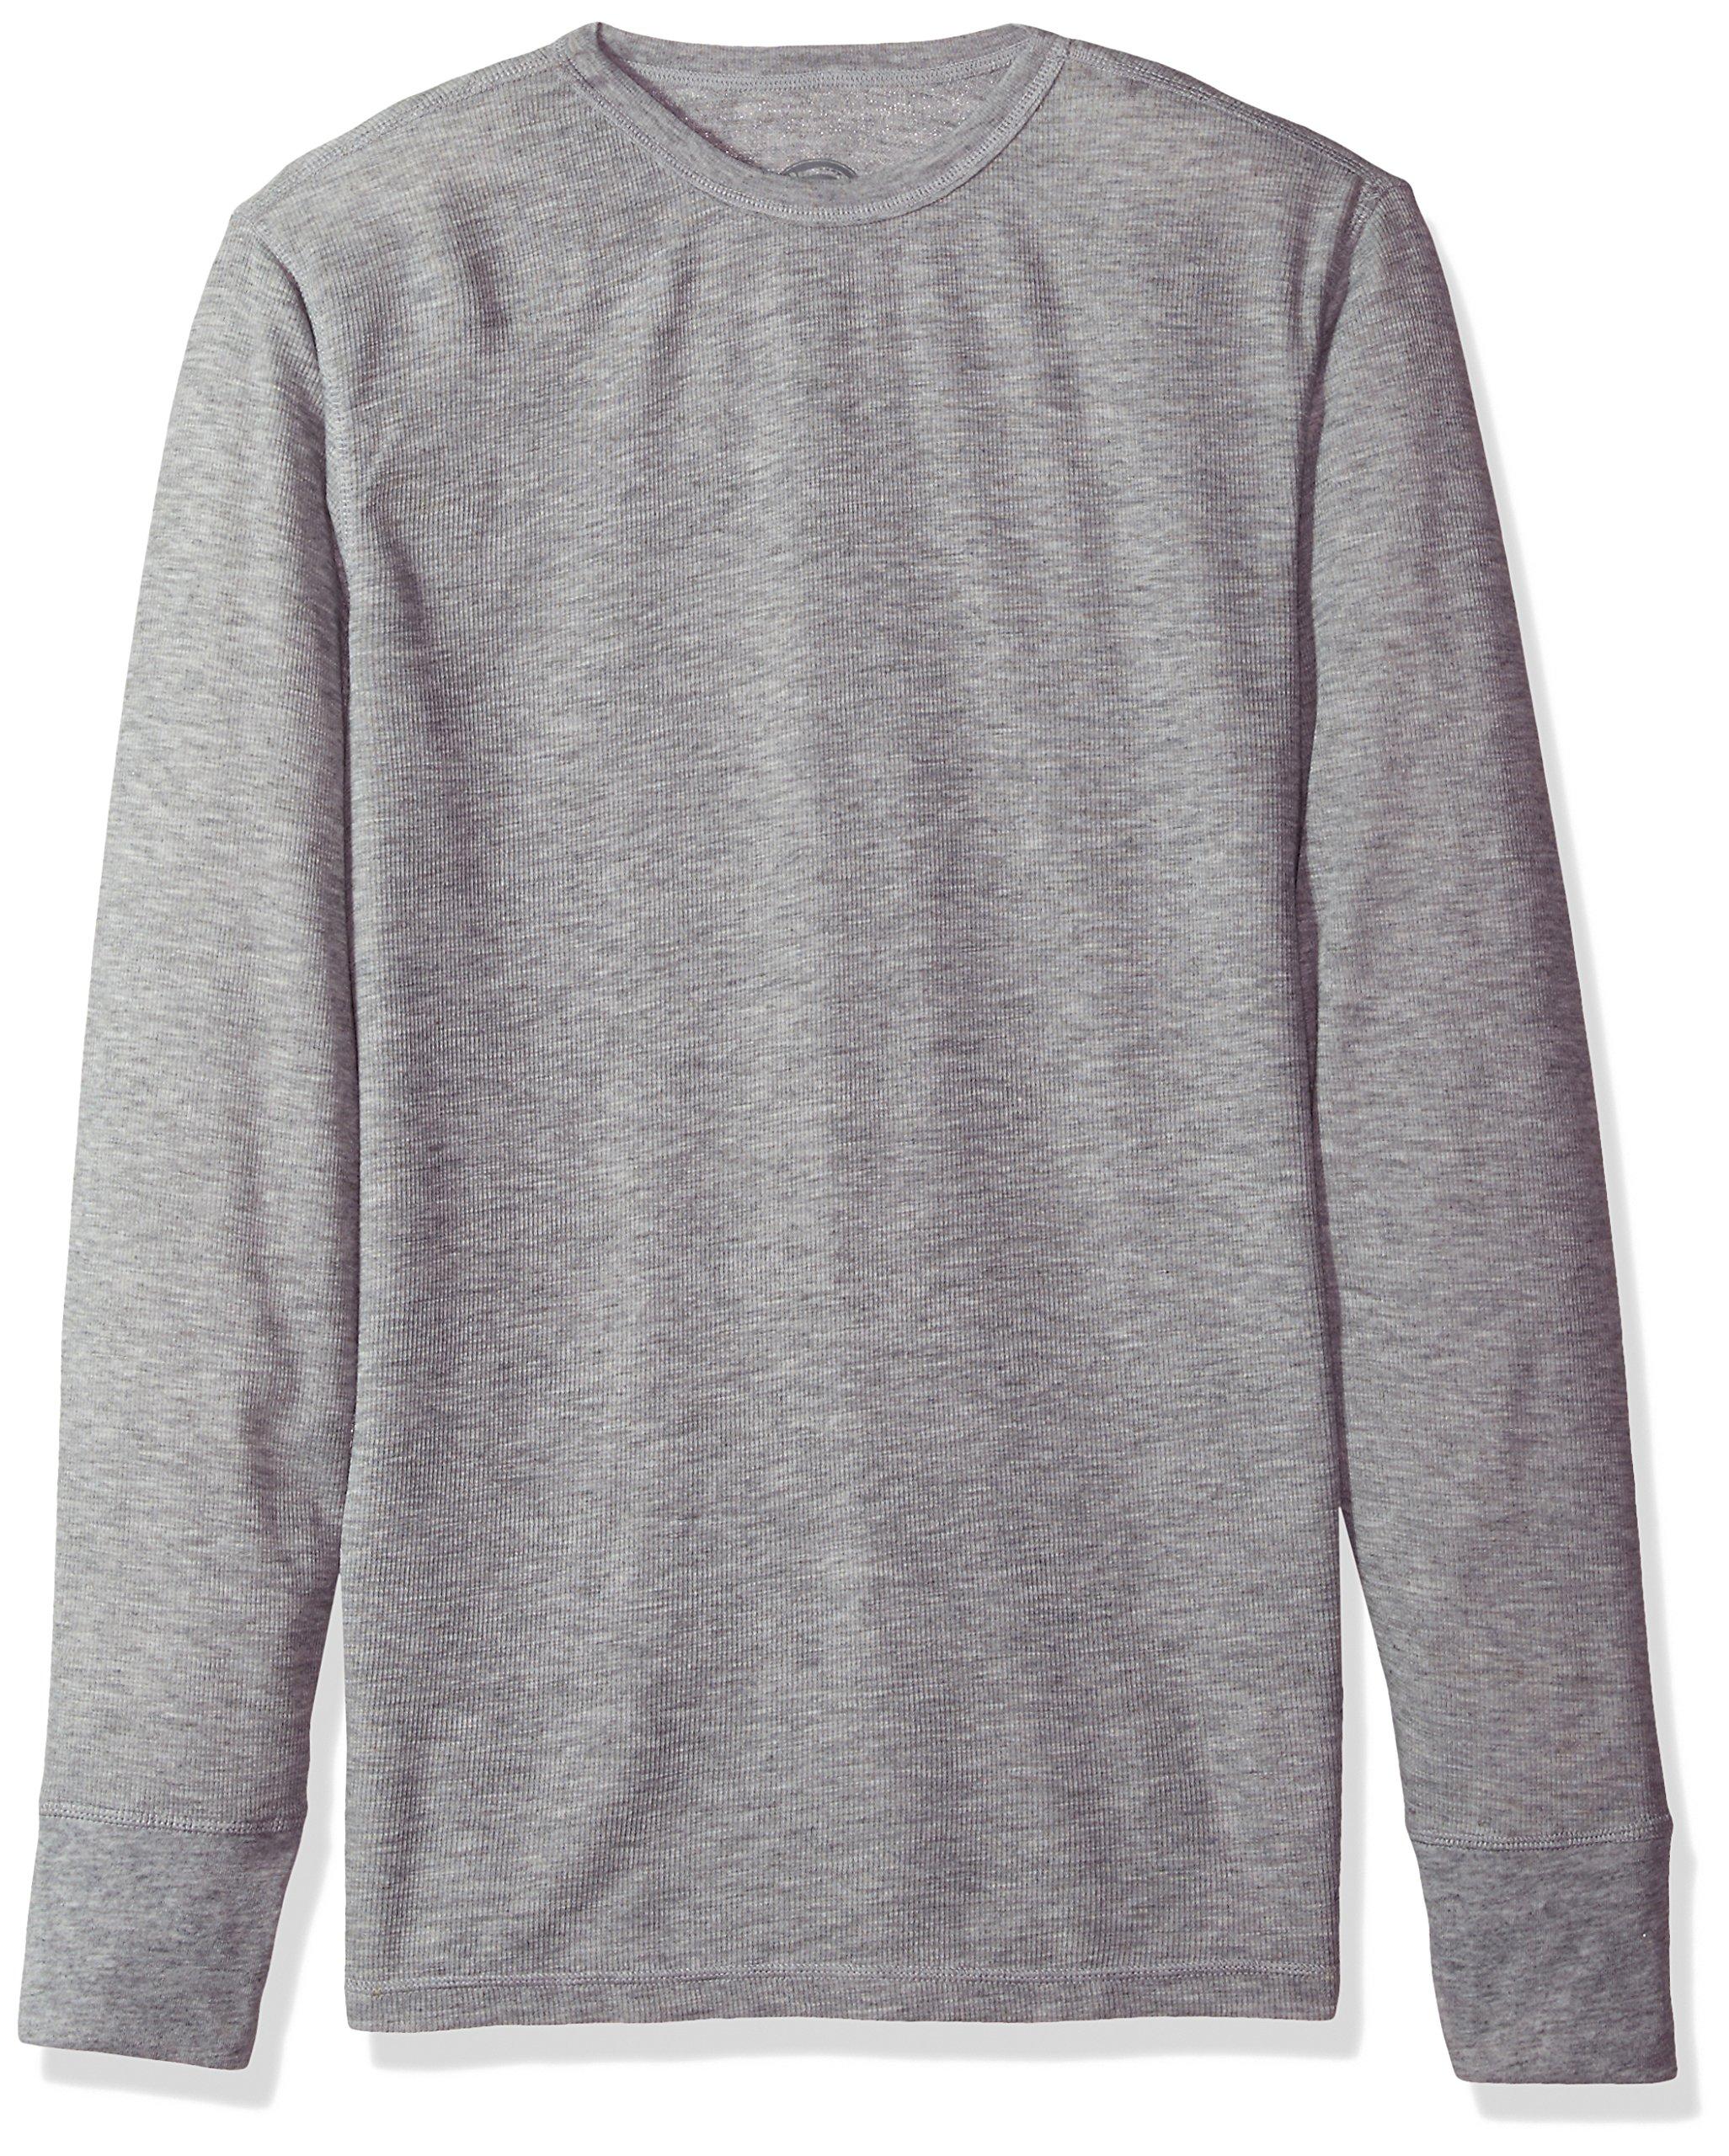 Dickies Men's Big Technical Wool Thermal Top, Heather Grey, Large/Tall by Dickies